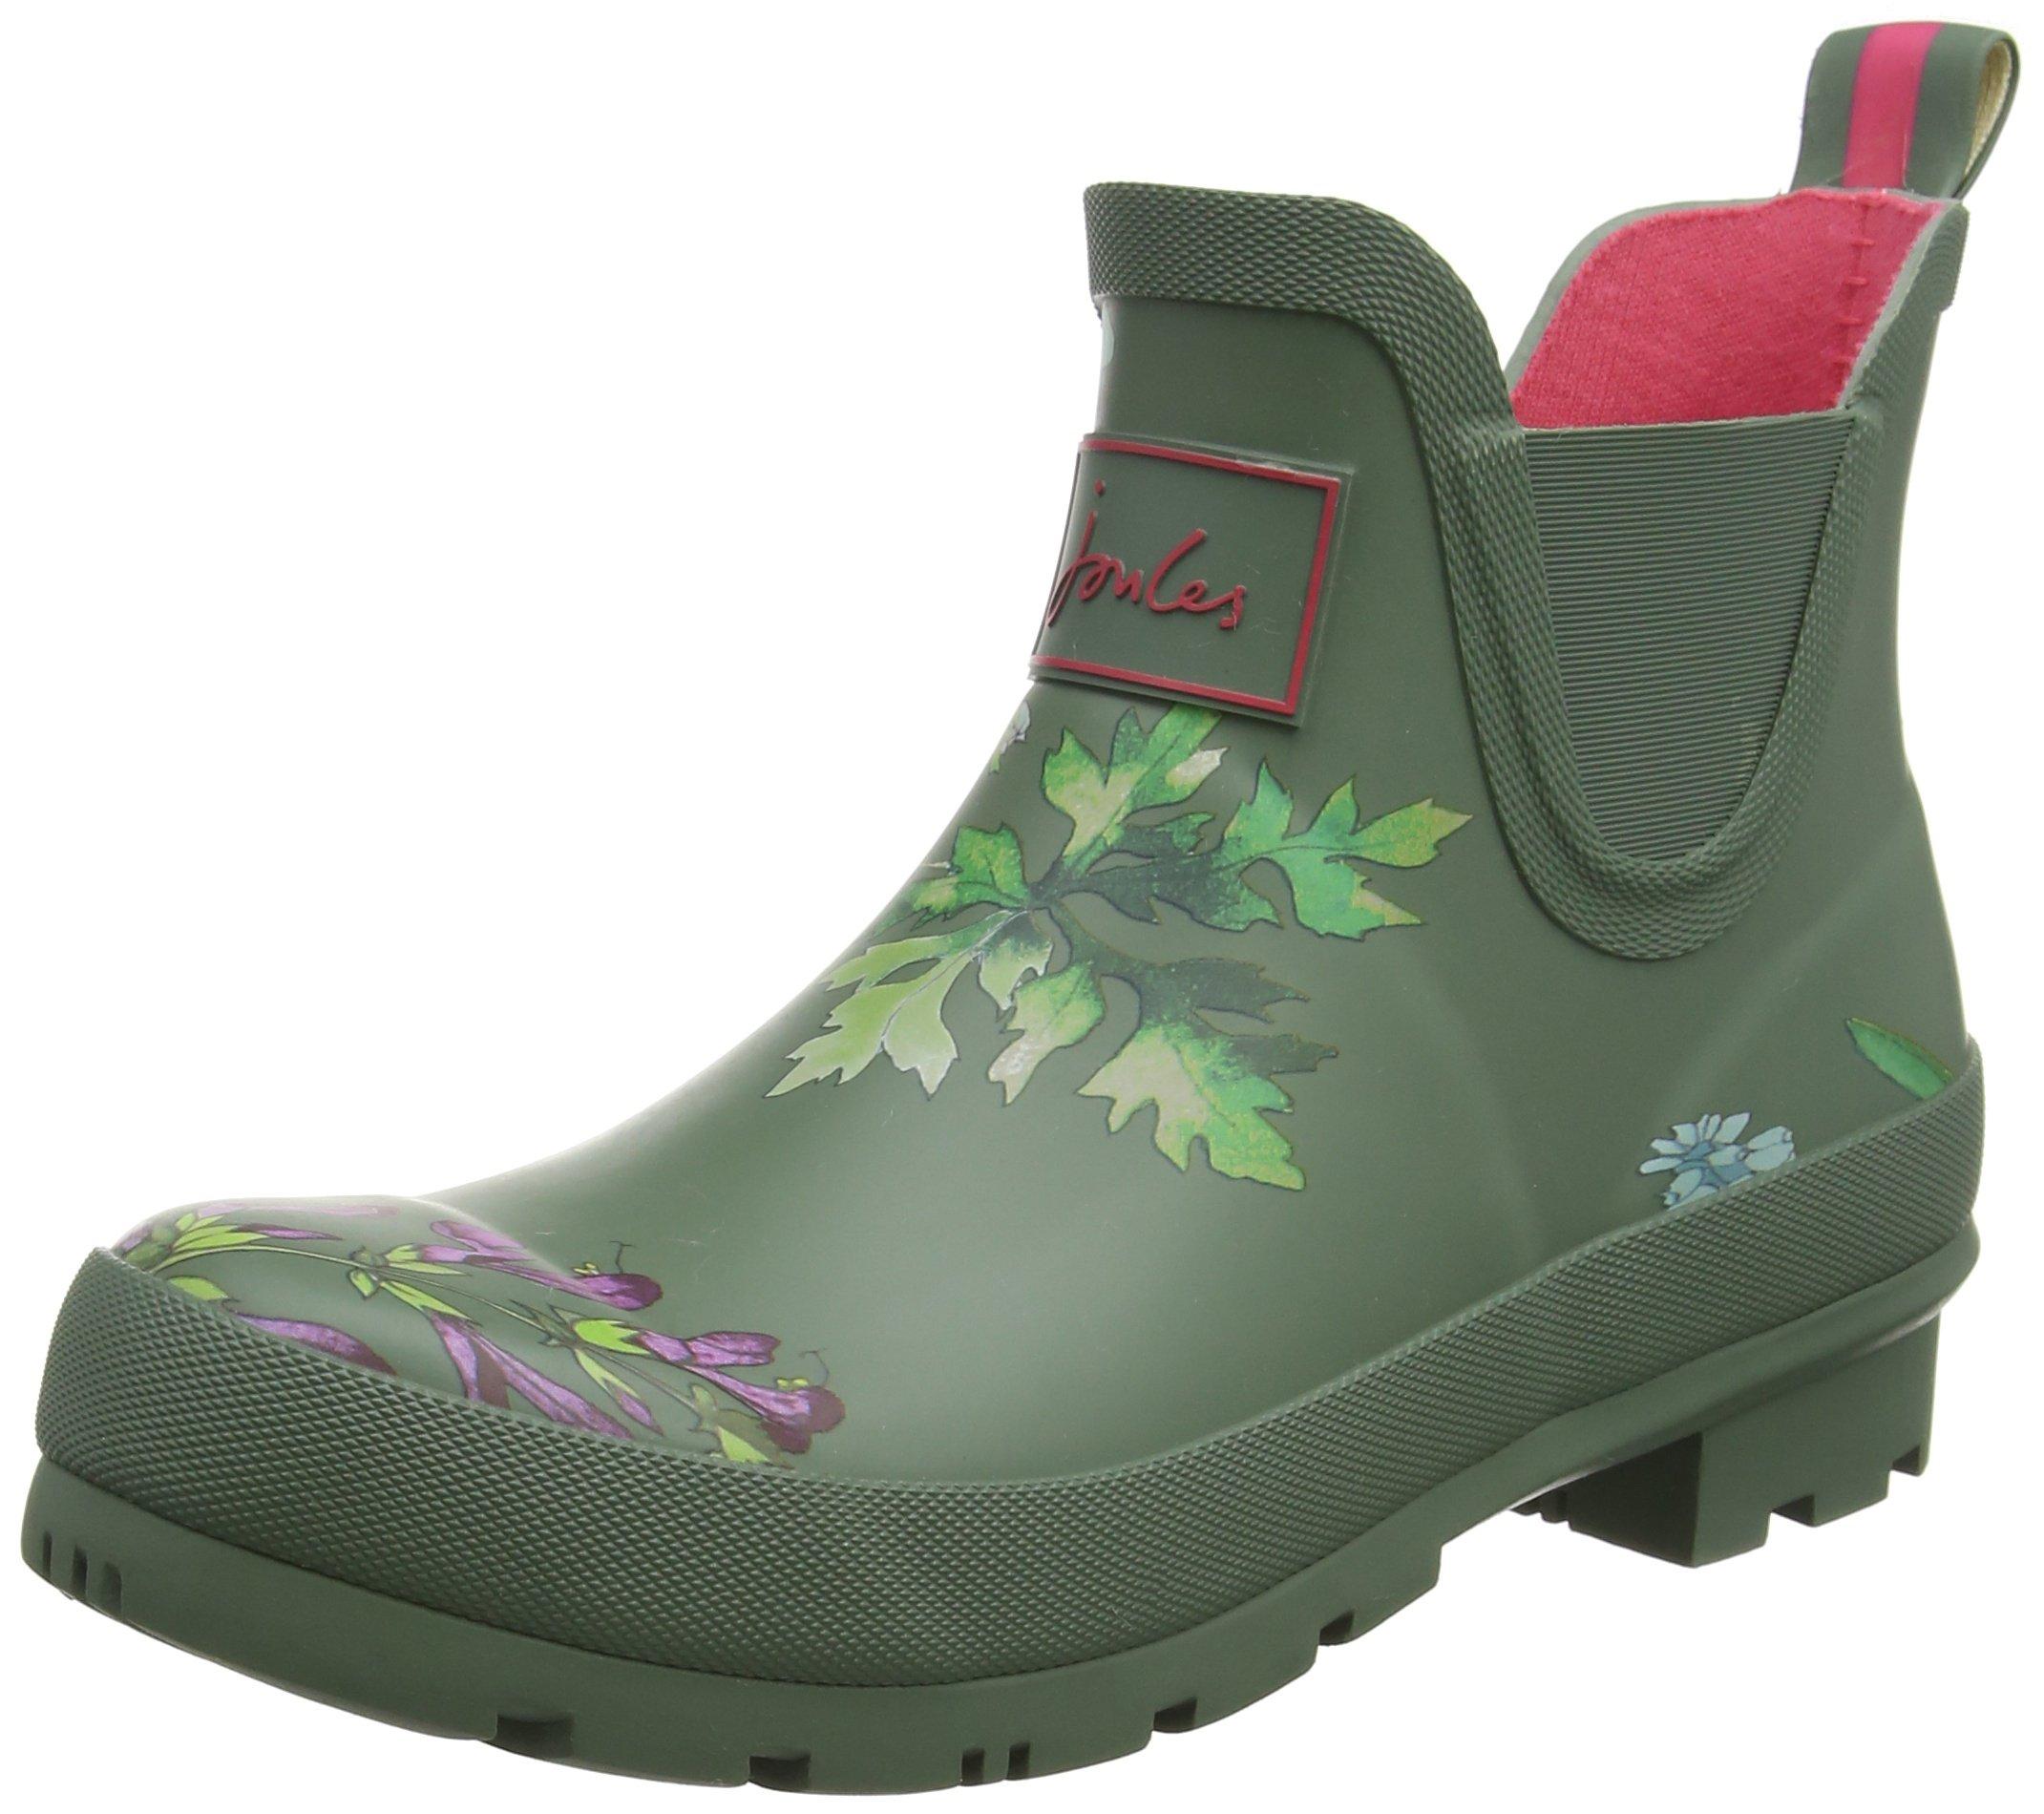 Joules Womens Wellibob Laurel Botanical Rubber Boots 7 US